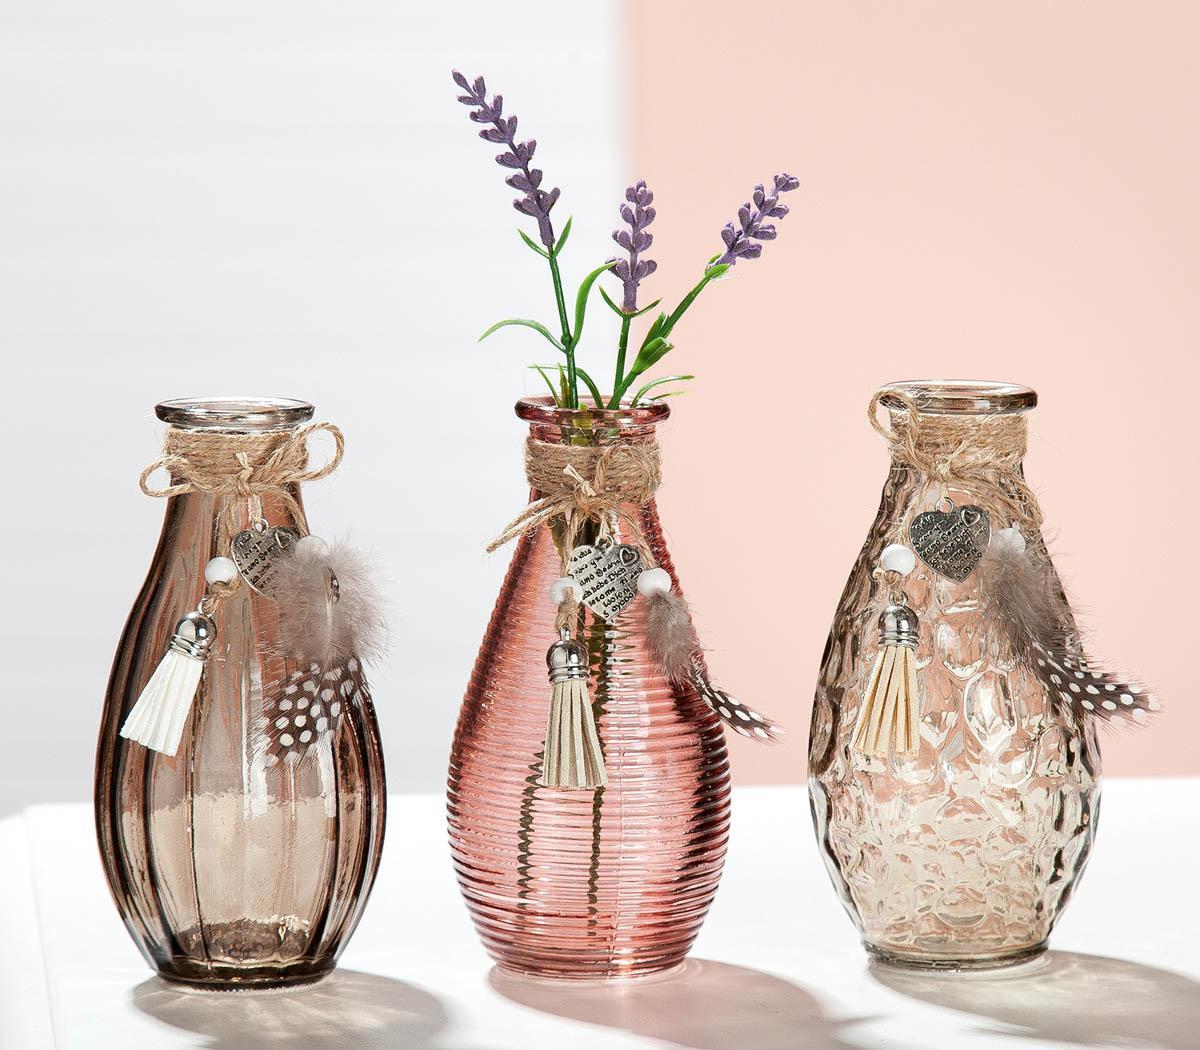 Sada váz Srdce, 3 kusy